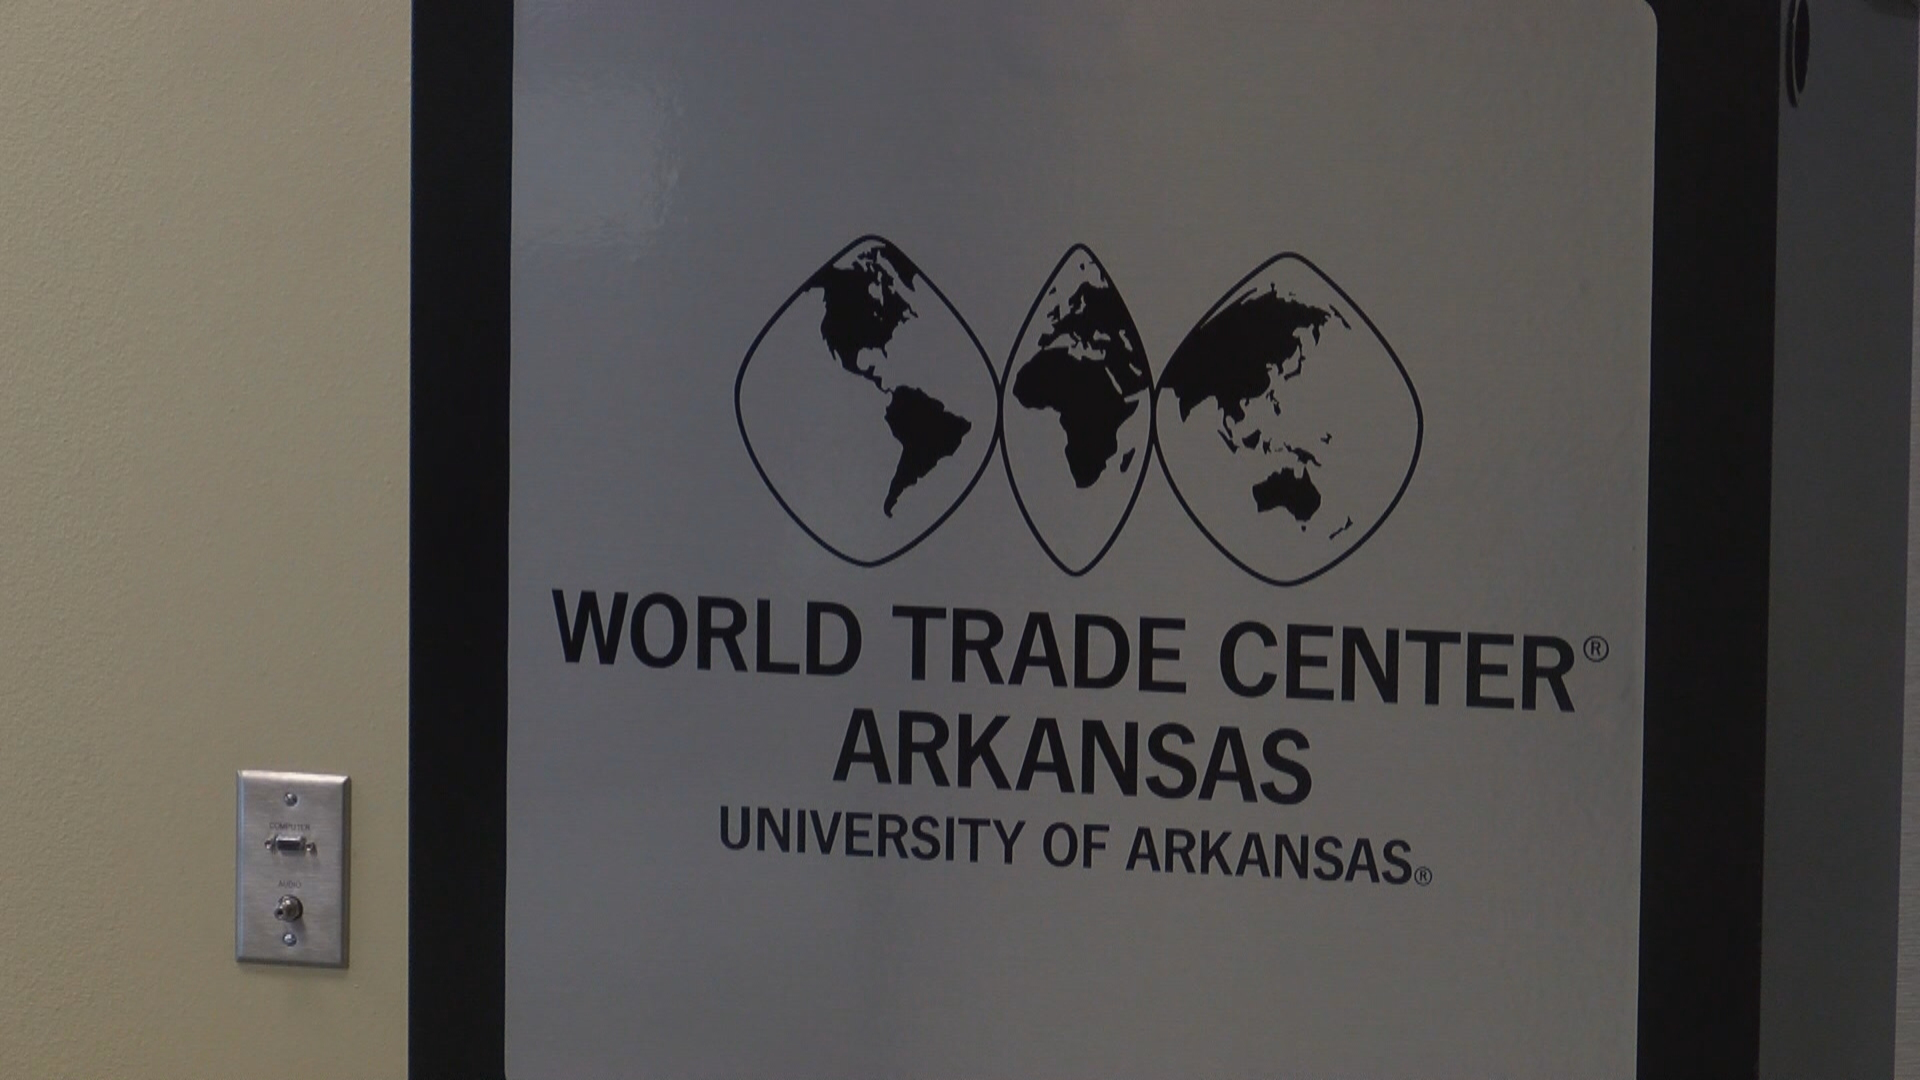 WORLD TRADE CENTER ARKANSAS